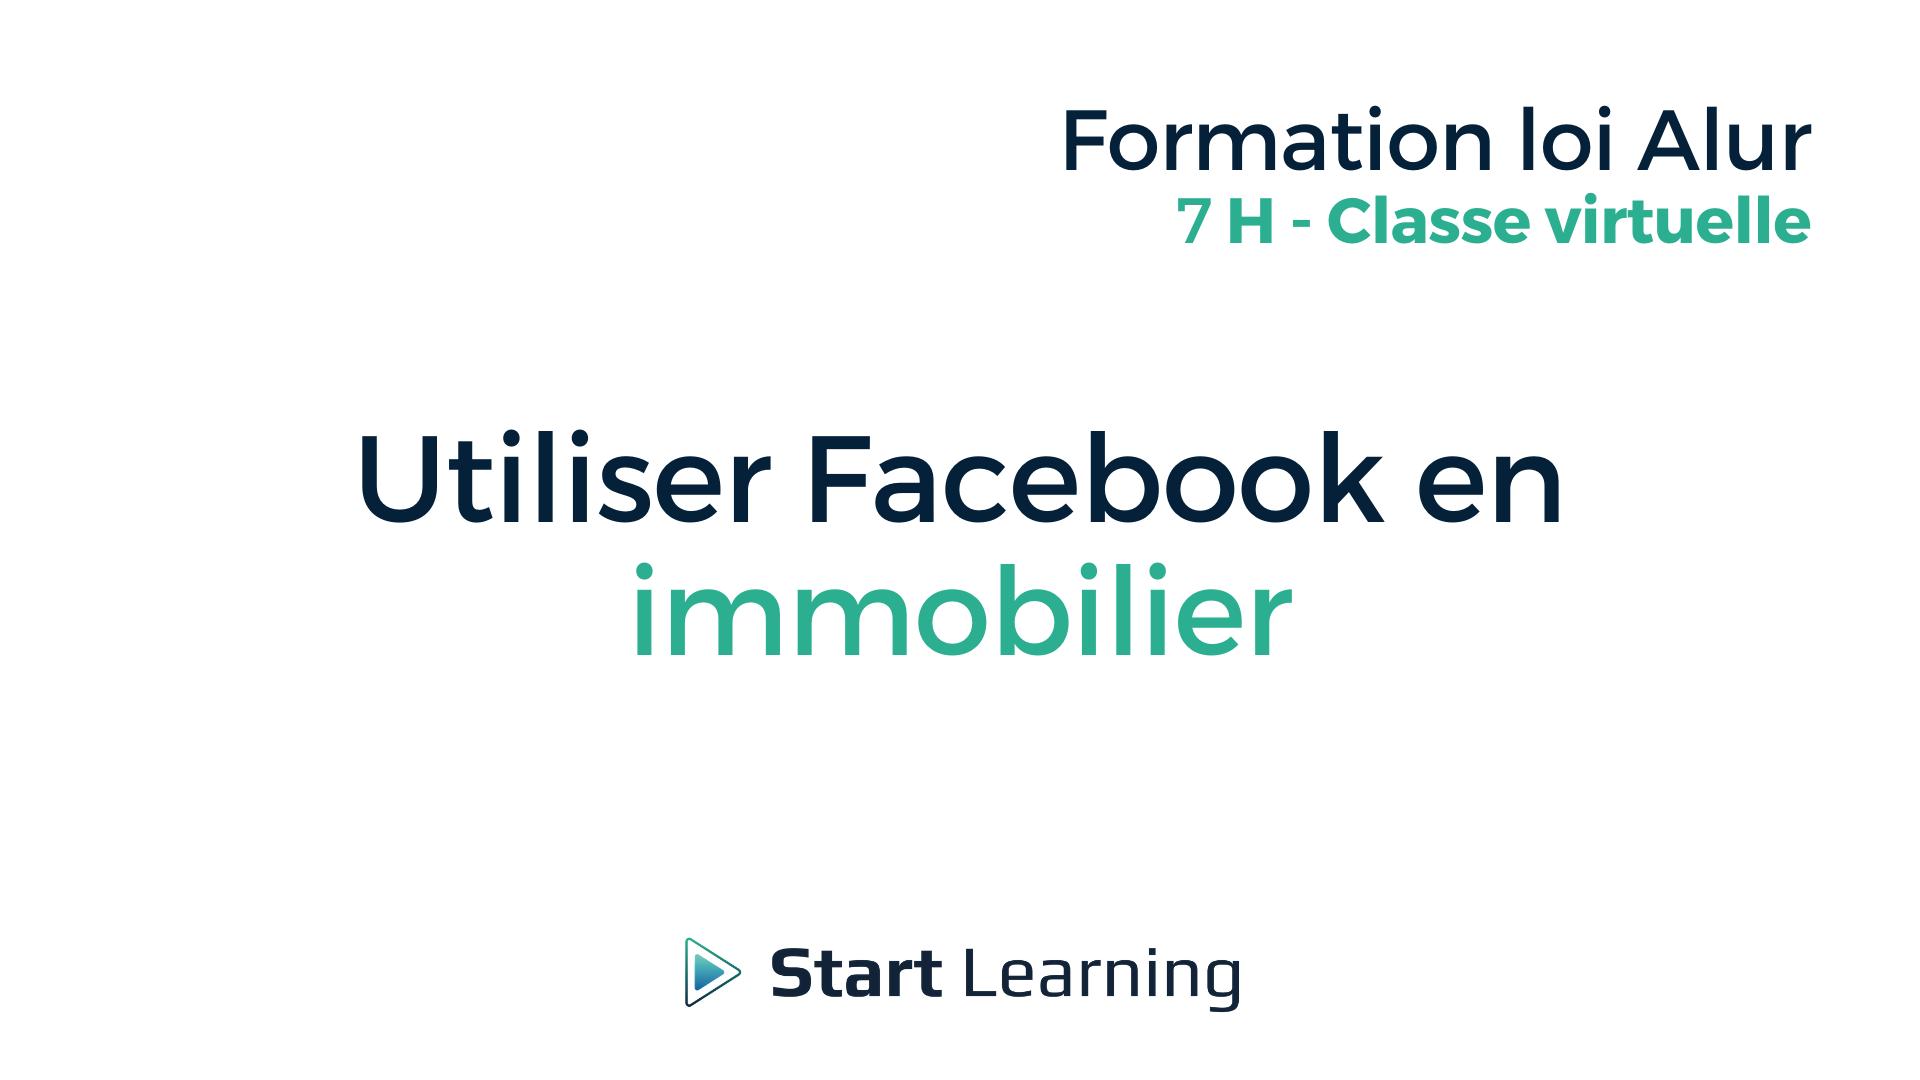 Utiliser Facebook en immobilier 7h - Classe virtuelle